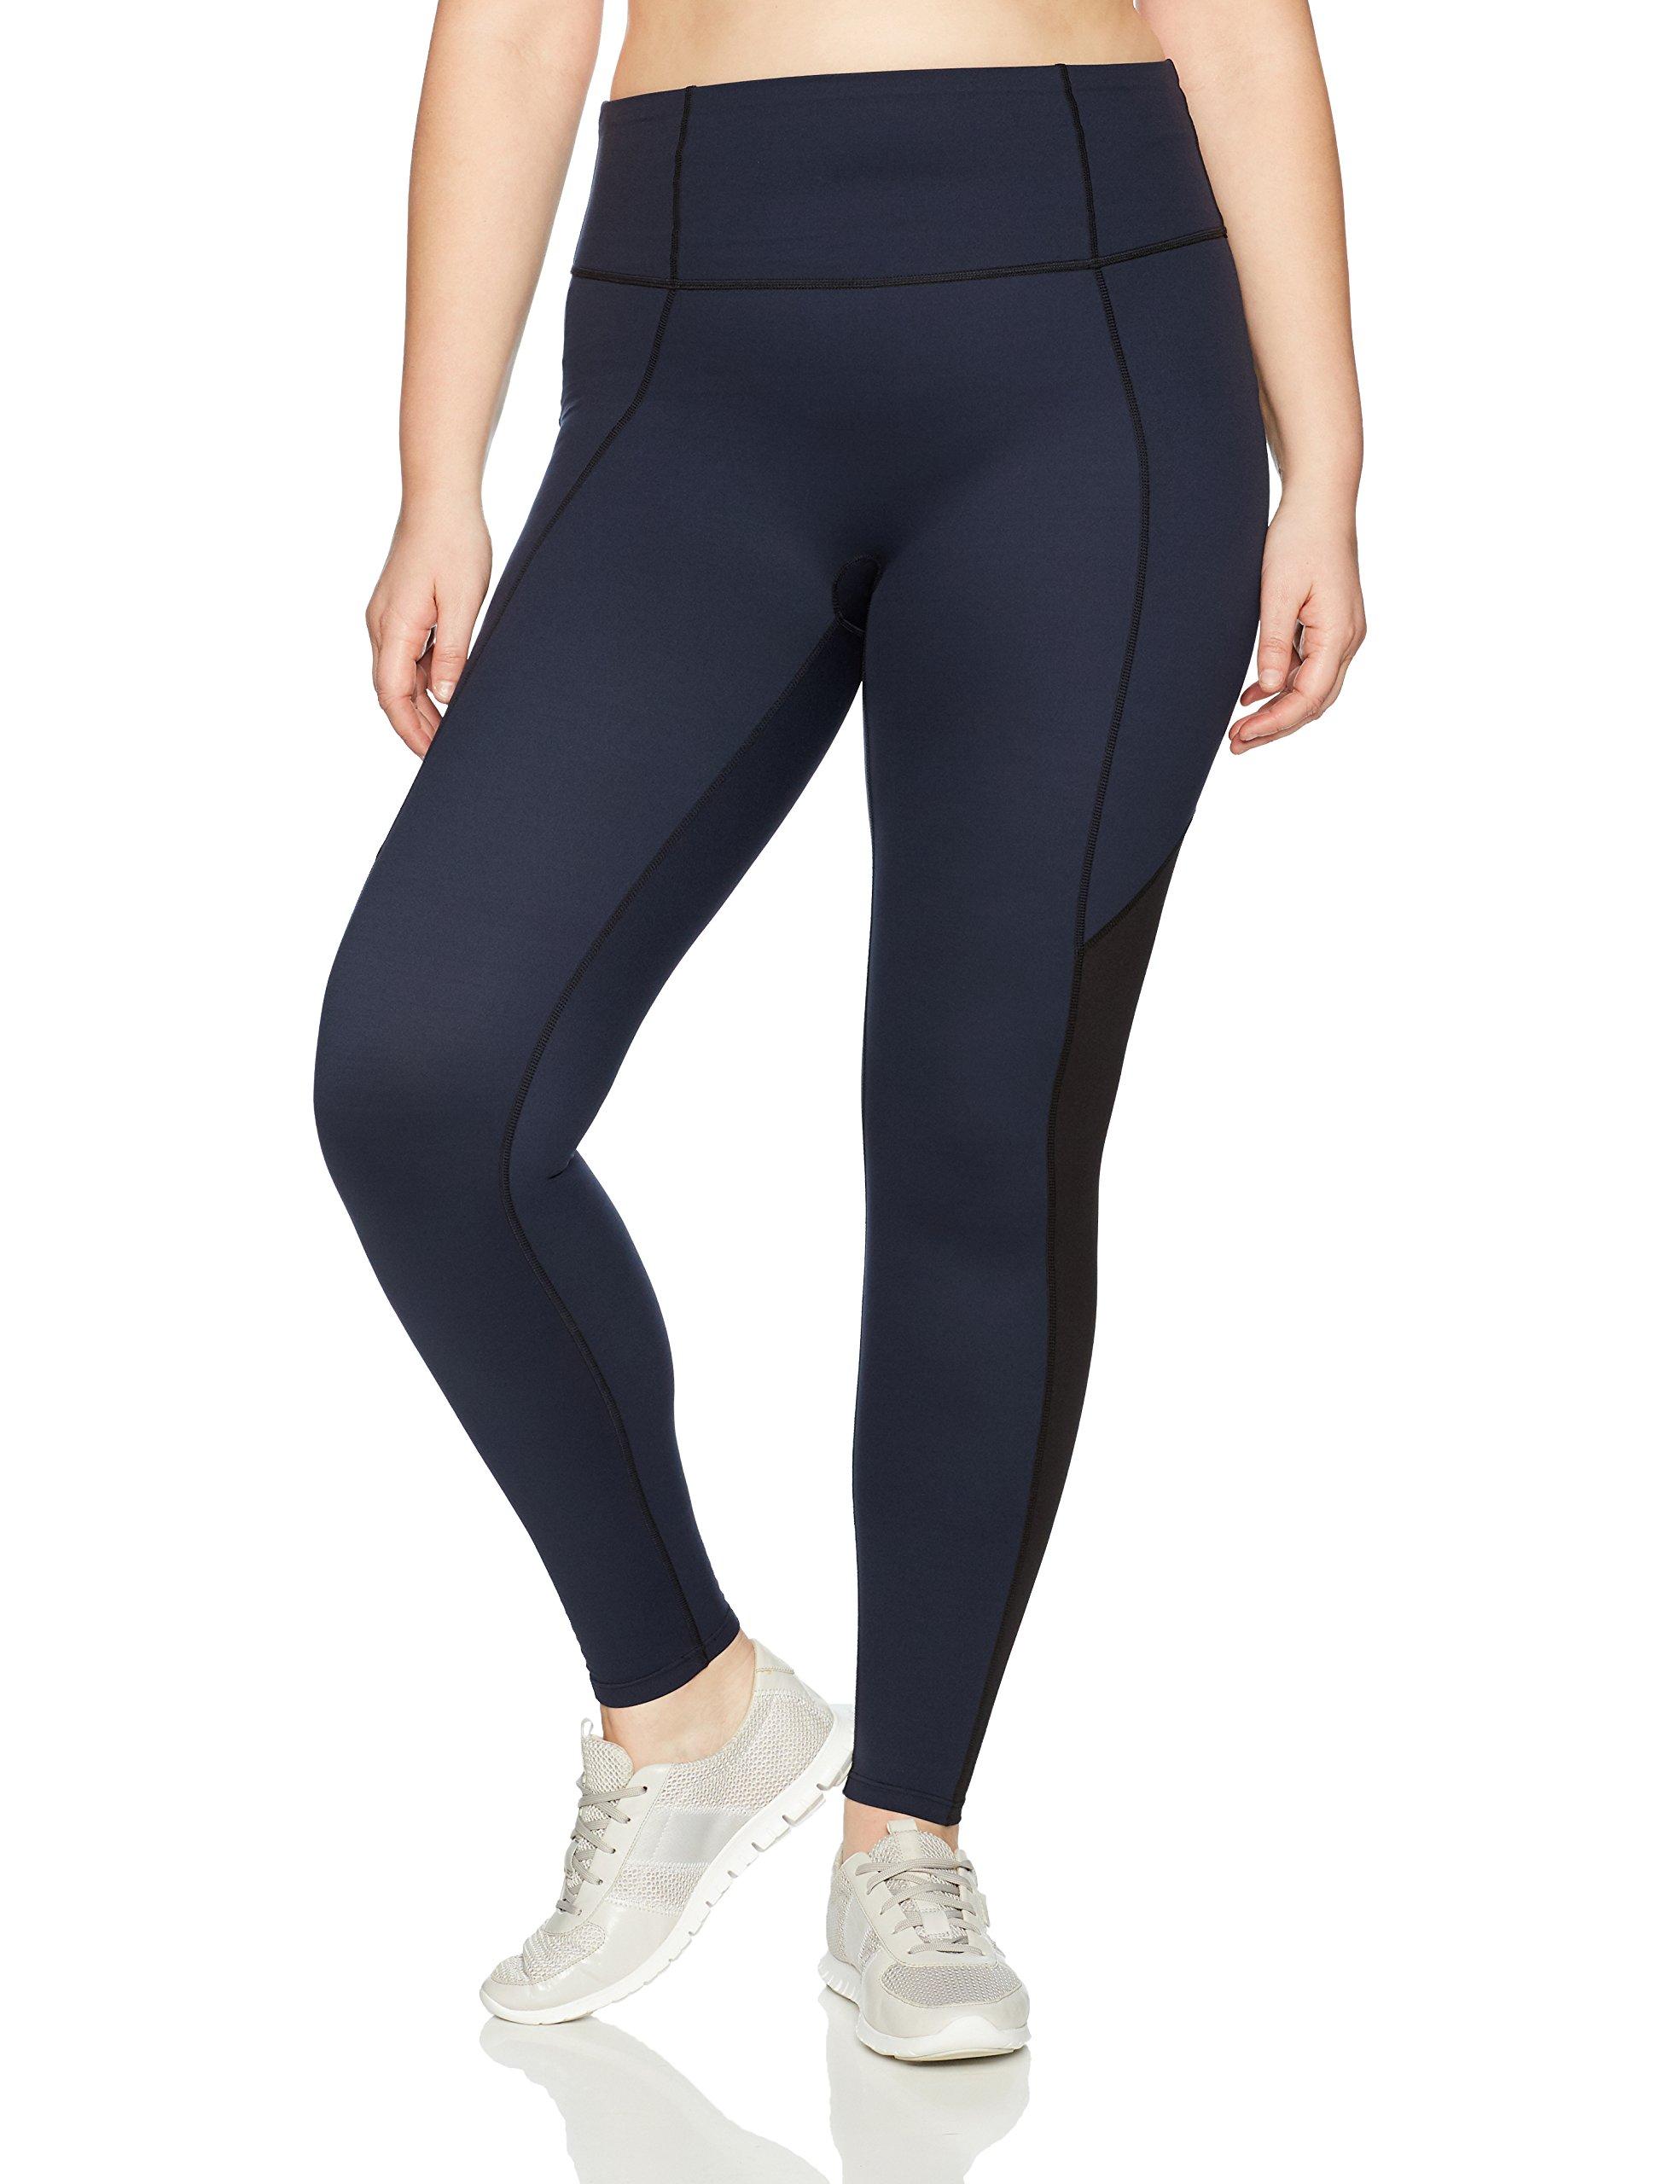 Spanx Women's Plus Size Active Compression Full Length Leggings, Lapis Night, 1X